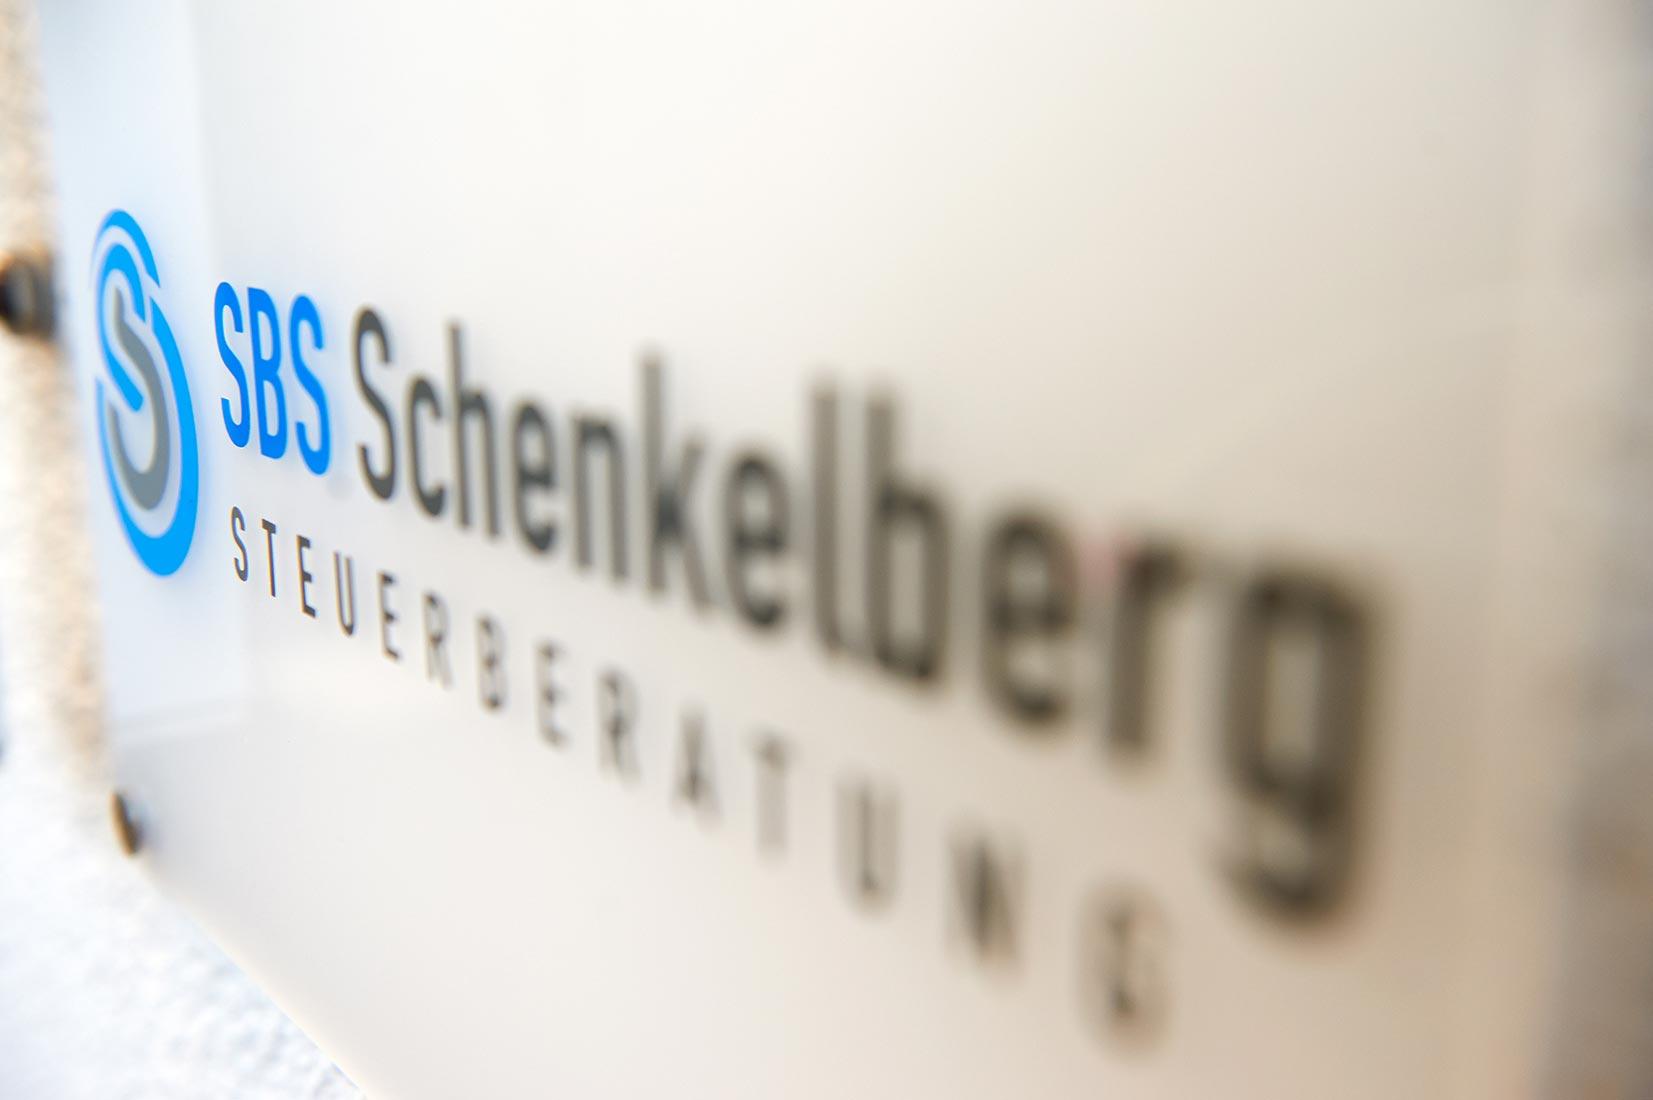 Corporate Fotografie Ambiente Steuerbüro SBS Schenkelberg, Herschbach/Selters